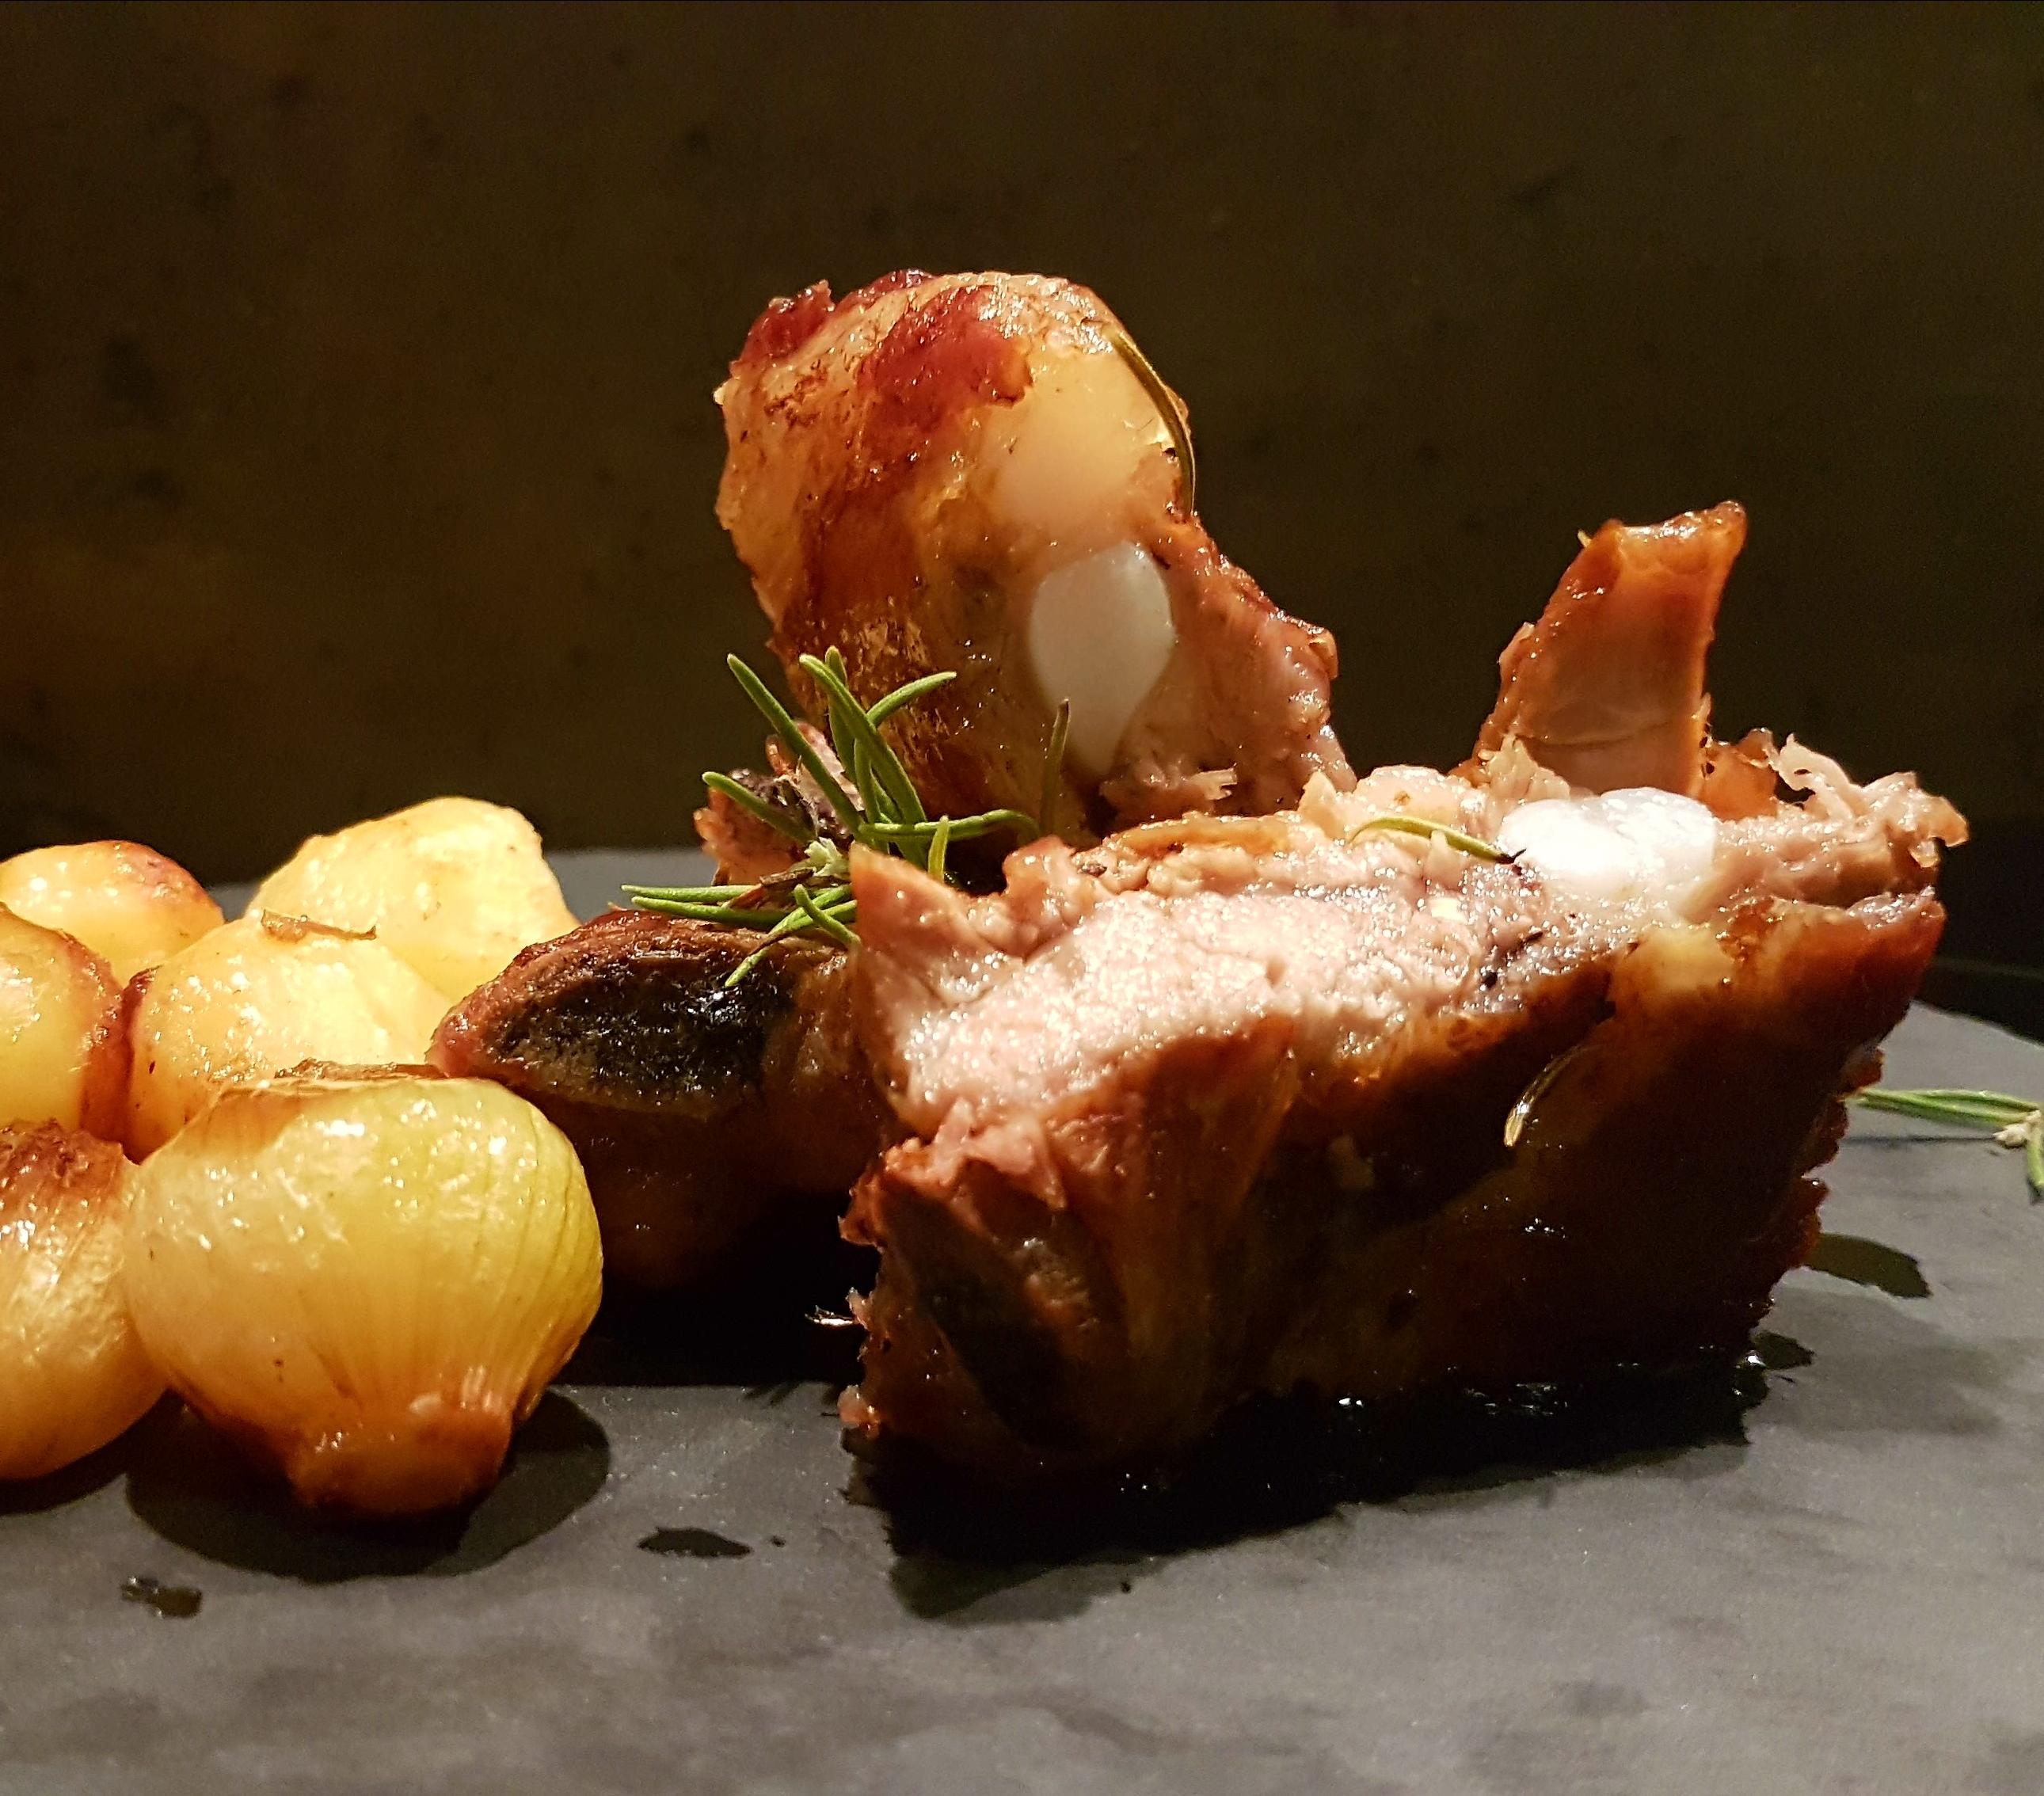 Costillss de cerdo al horno